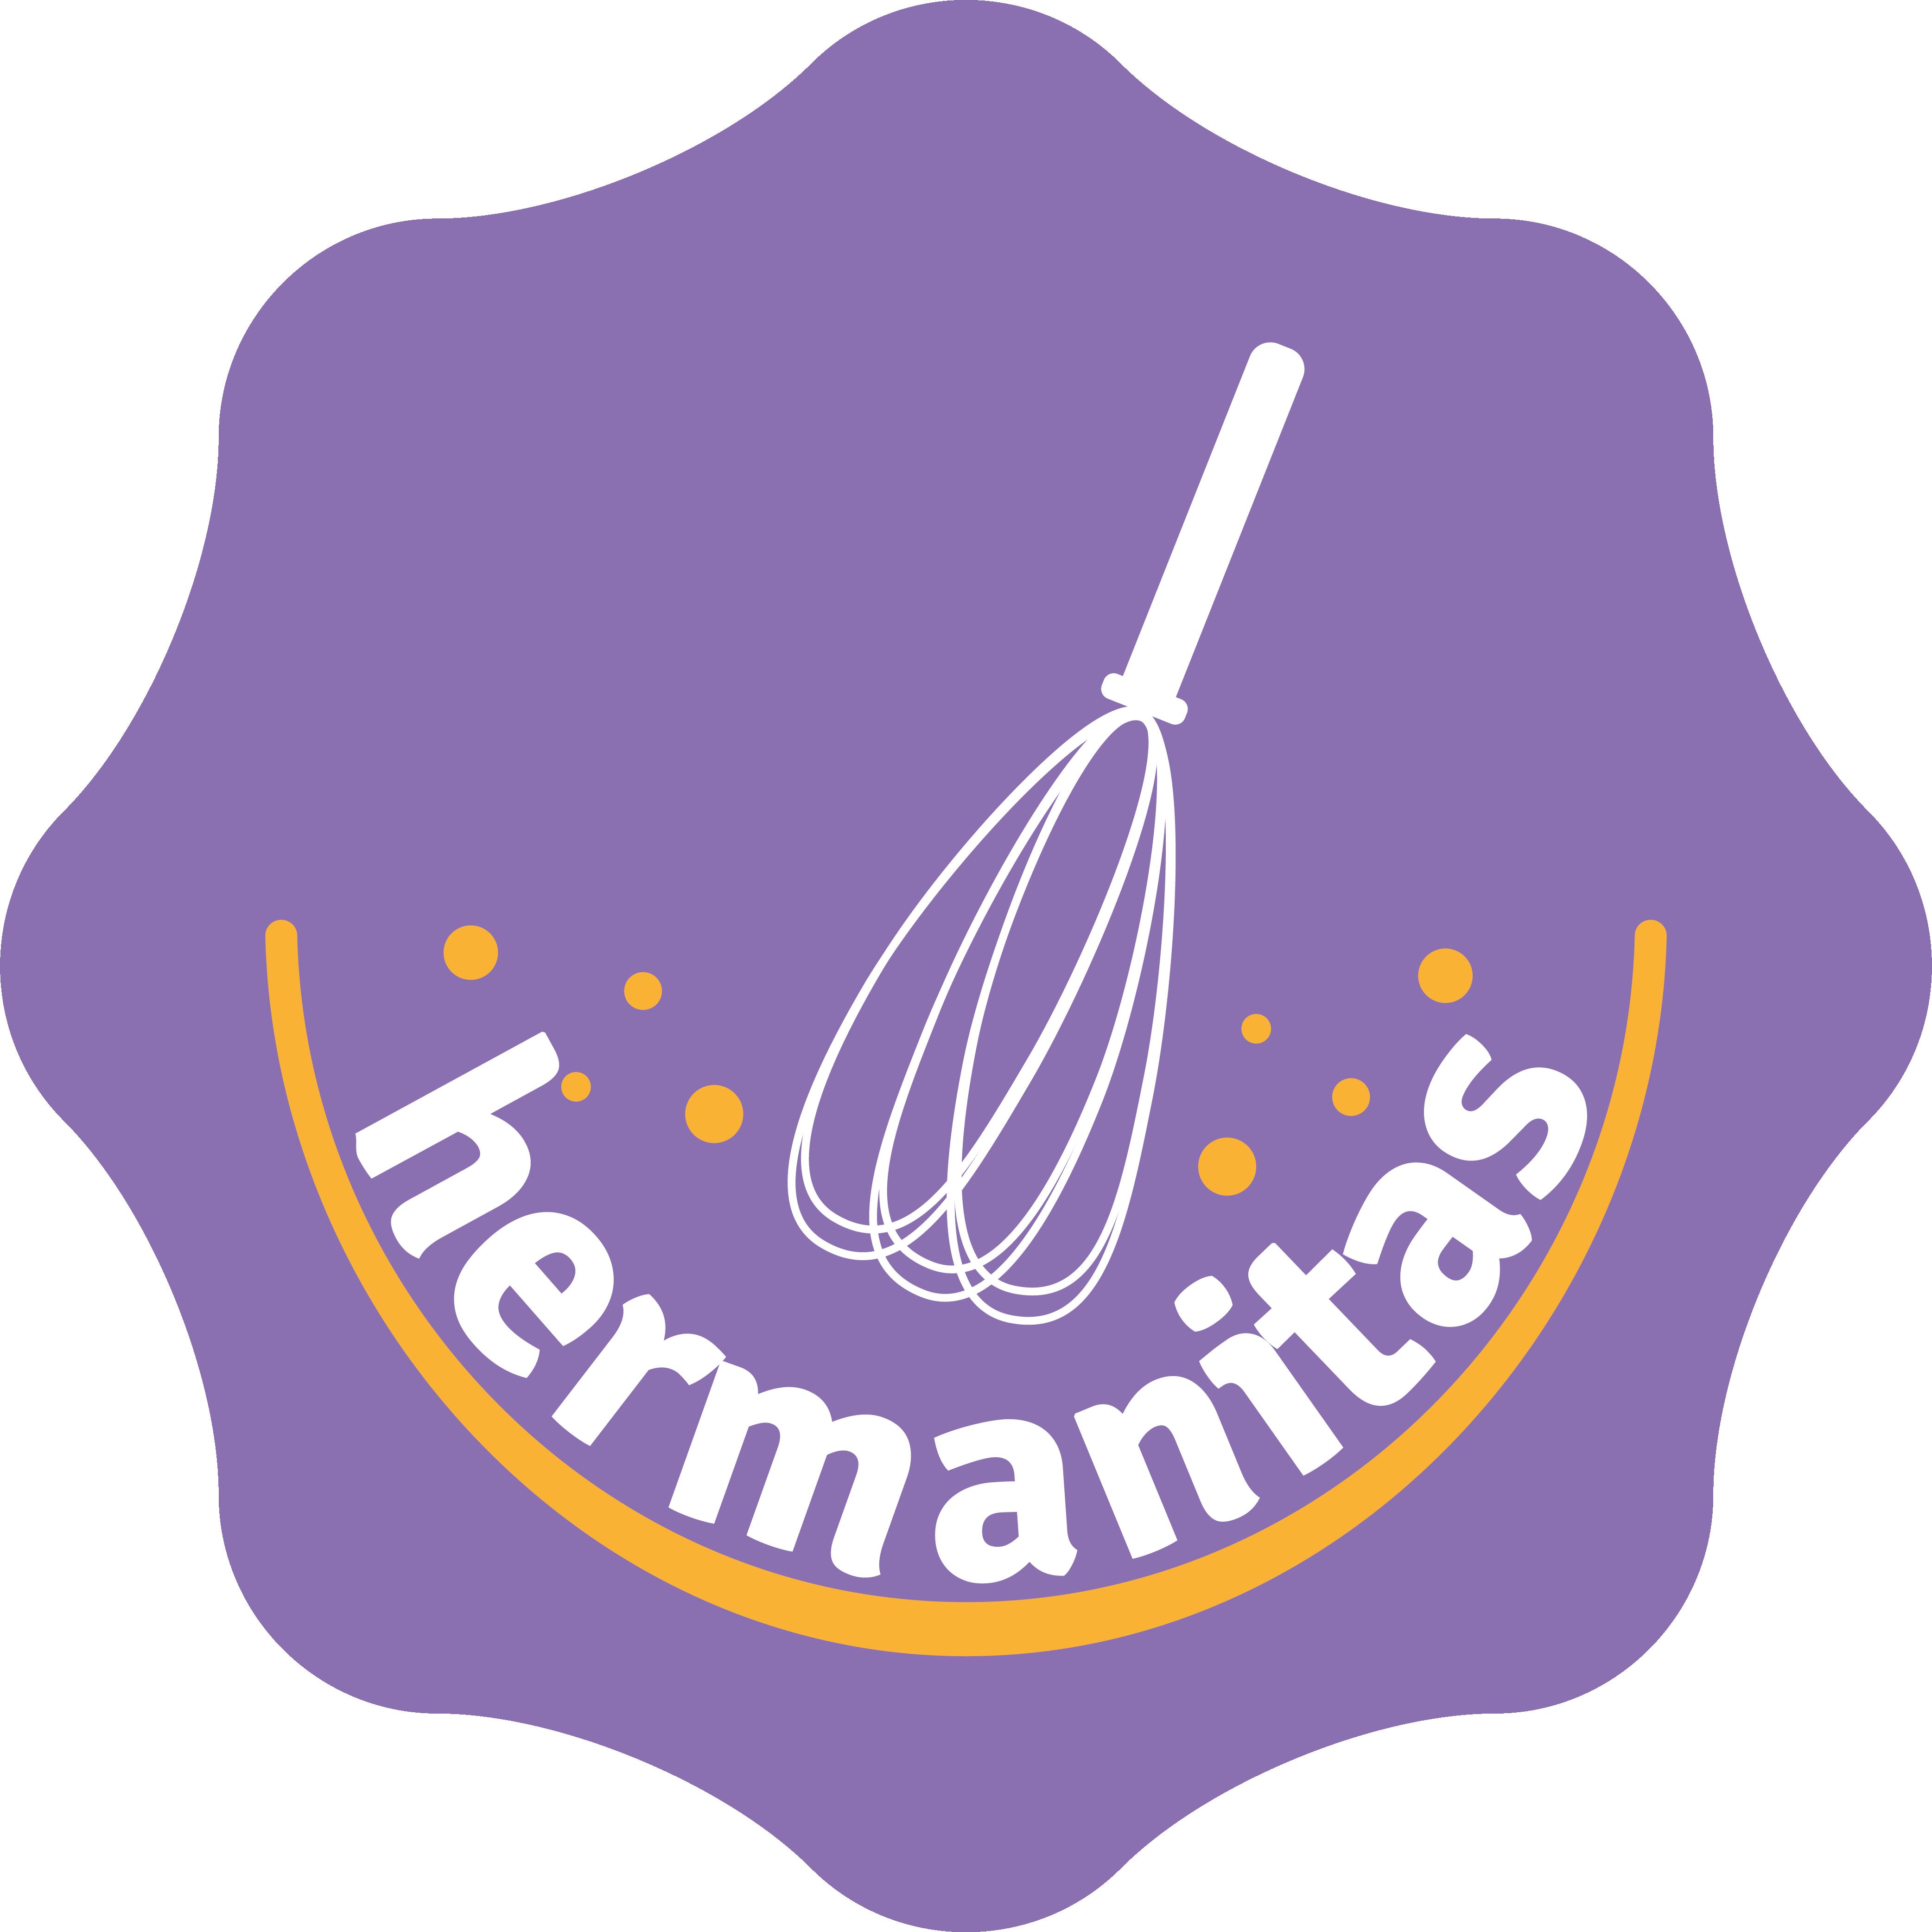 Hermanitas Food